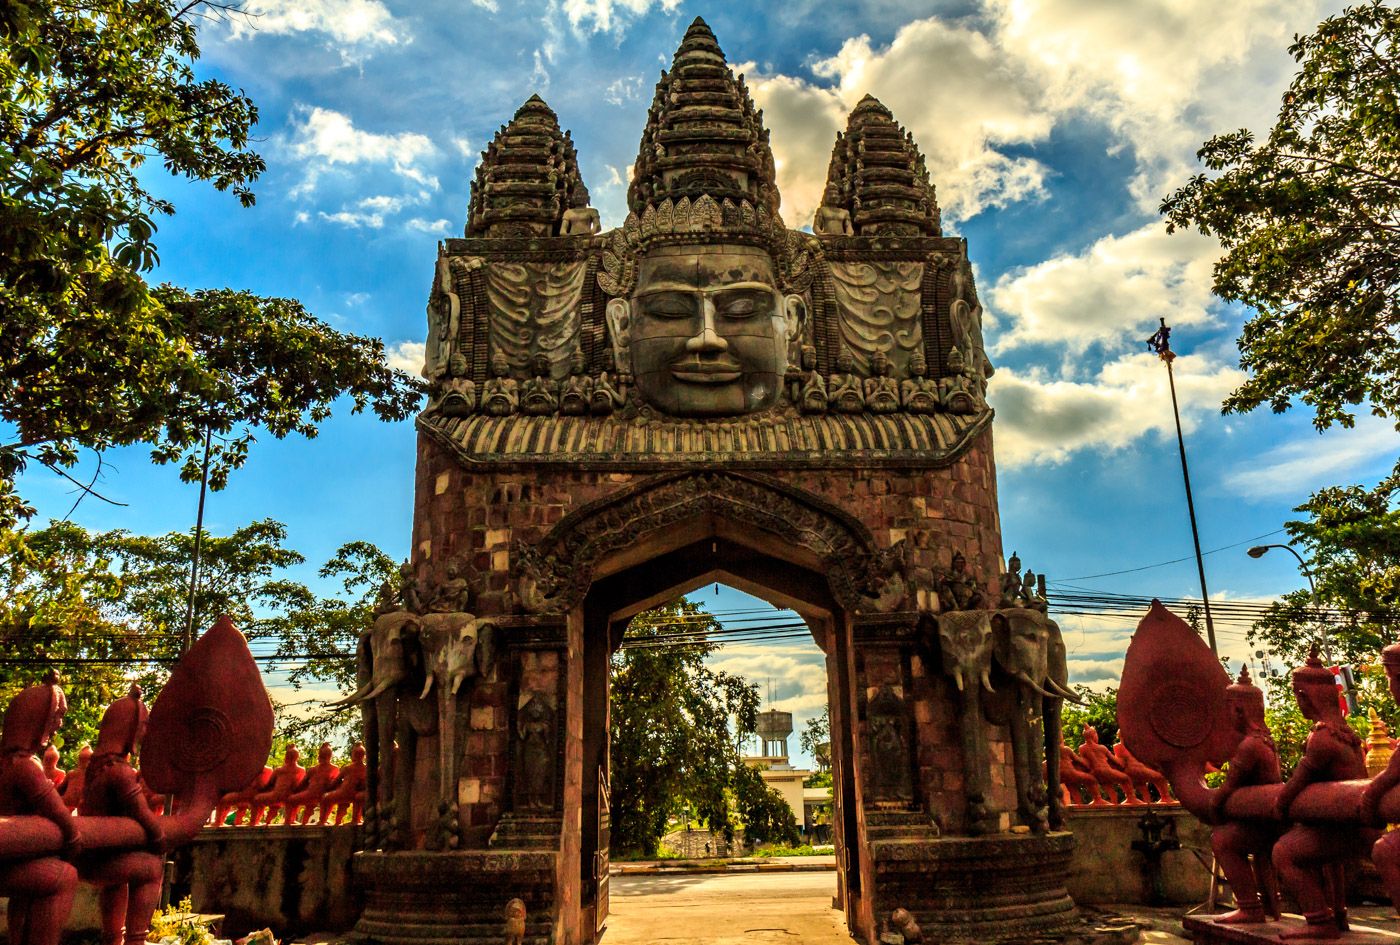 A modern Angkor-style gateway.